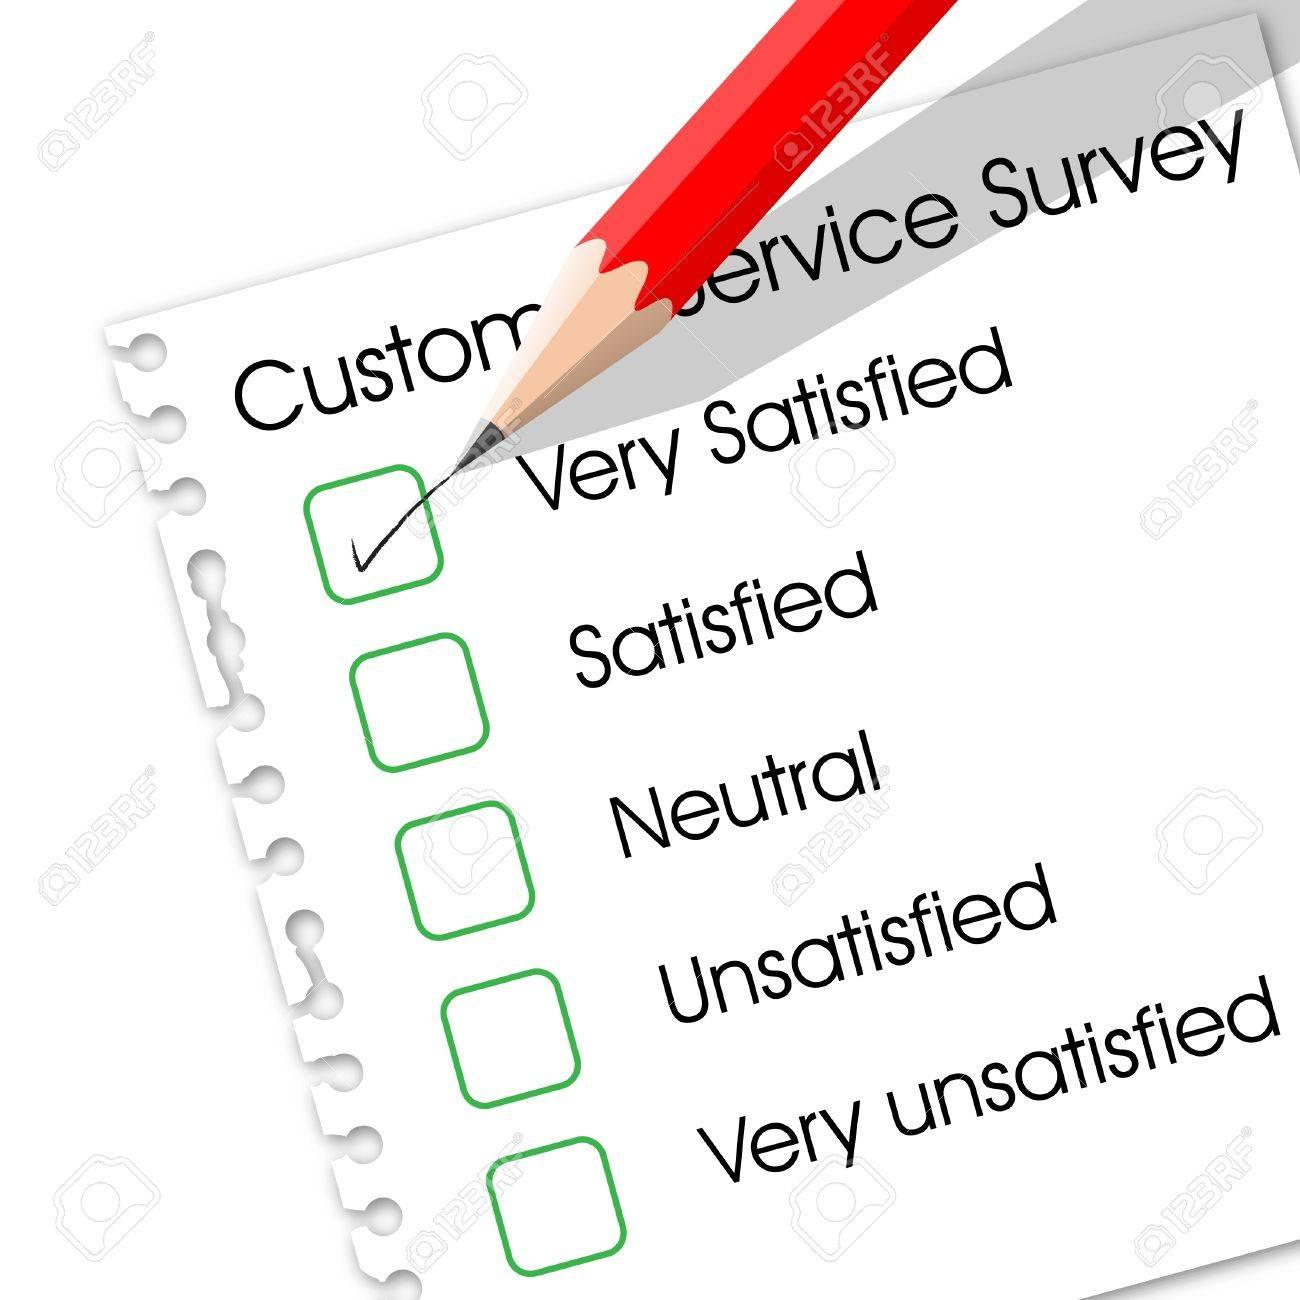 check box in customer service survey form Stock Photo - 9741013